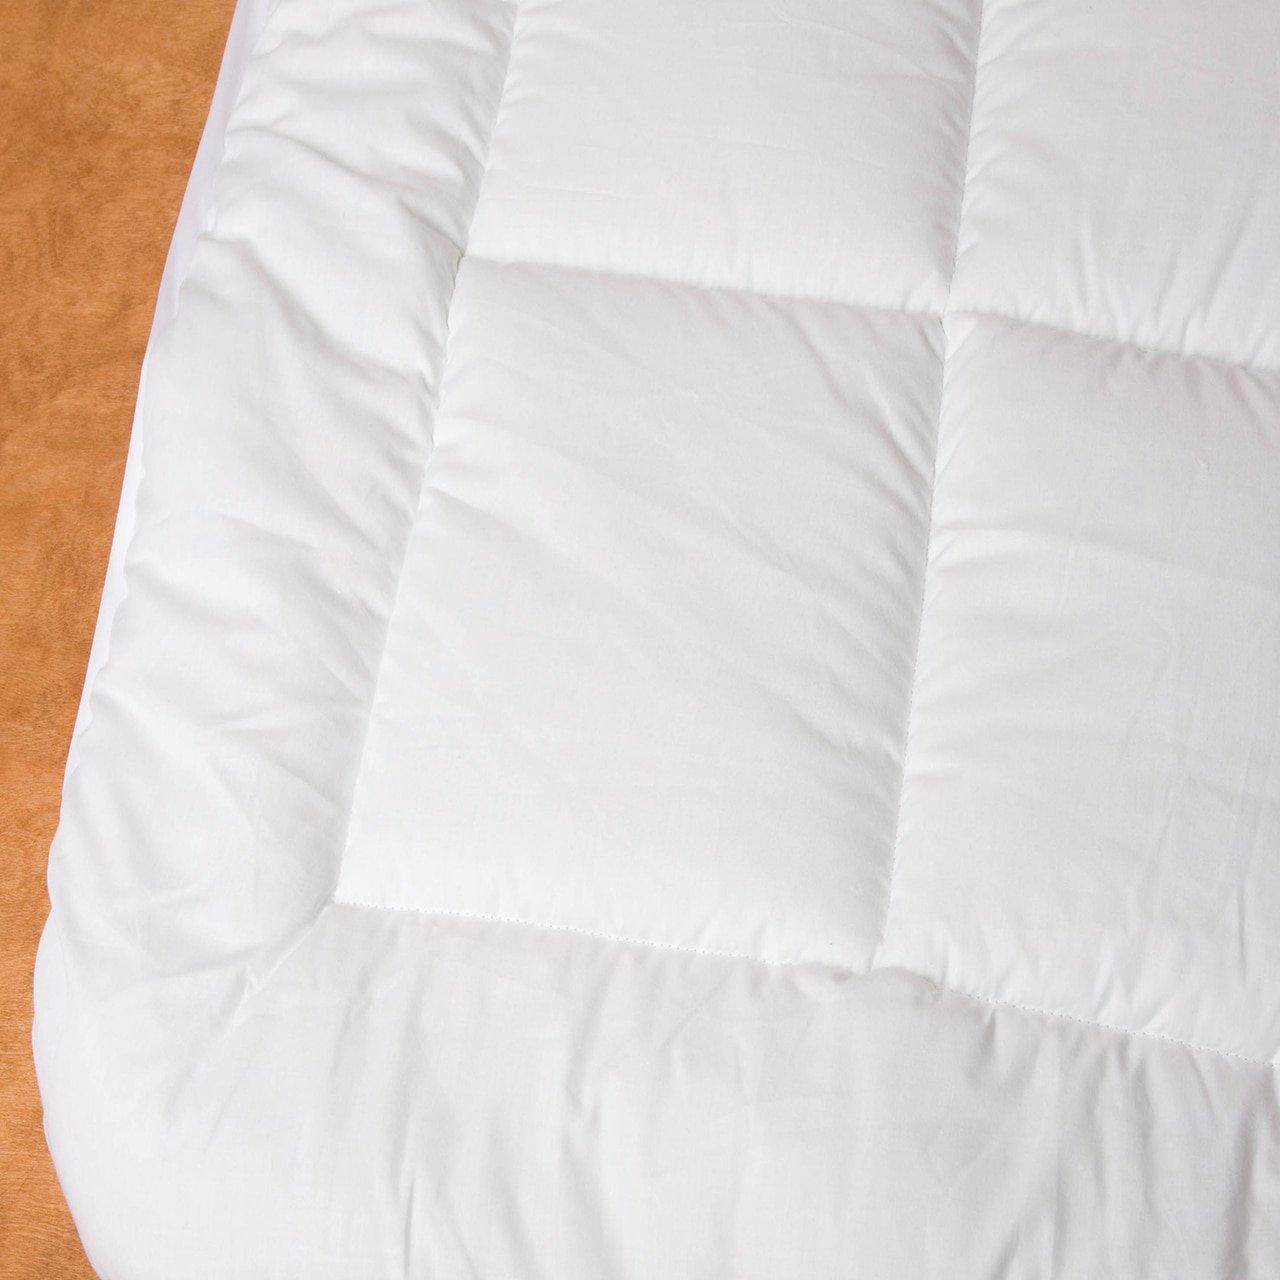 Marbella Hotel Pillow Top Mattress Pad Protector Cover - King (78''x80'')